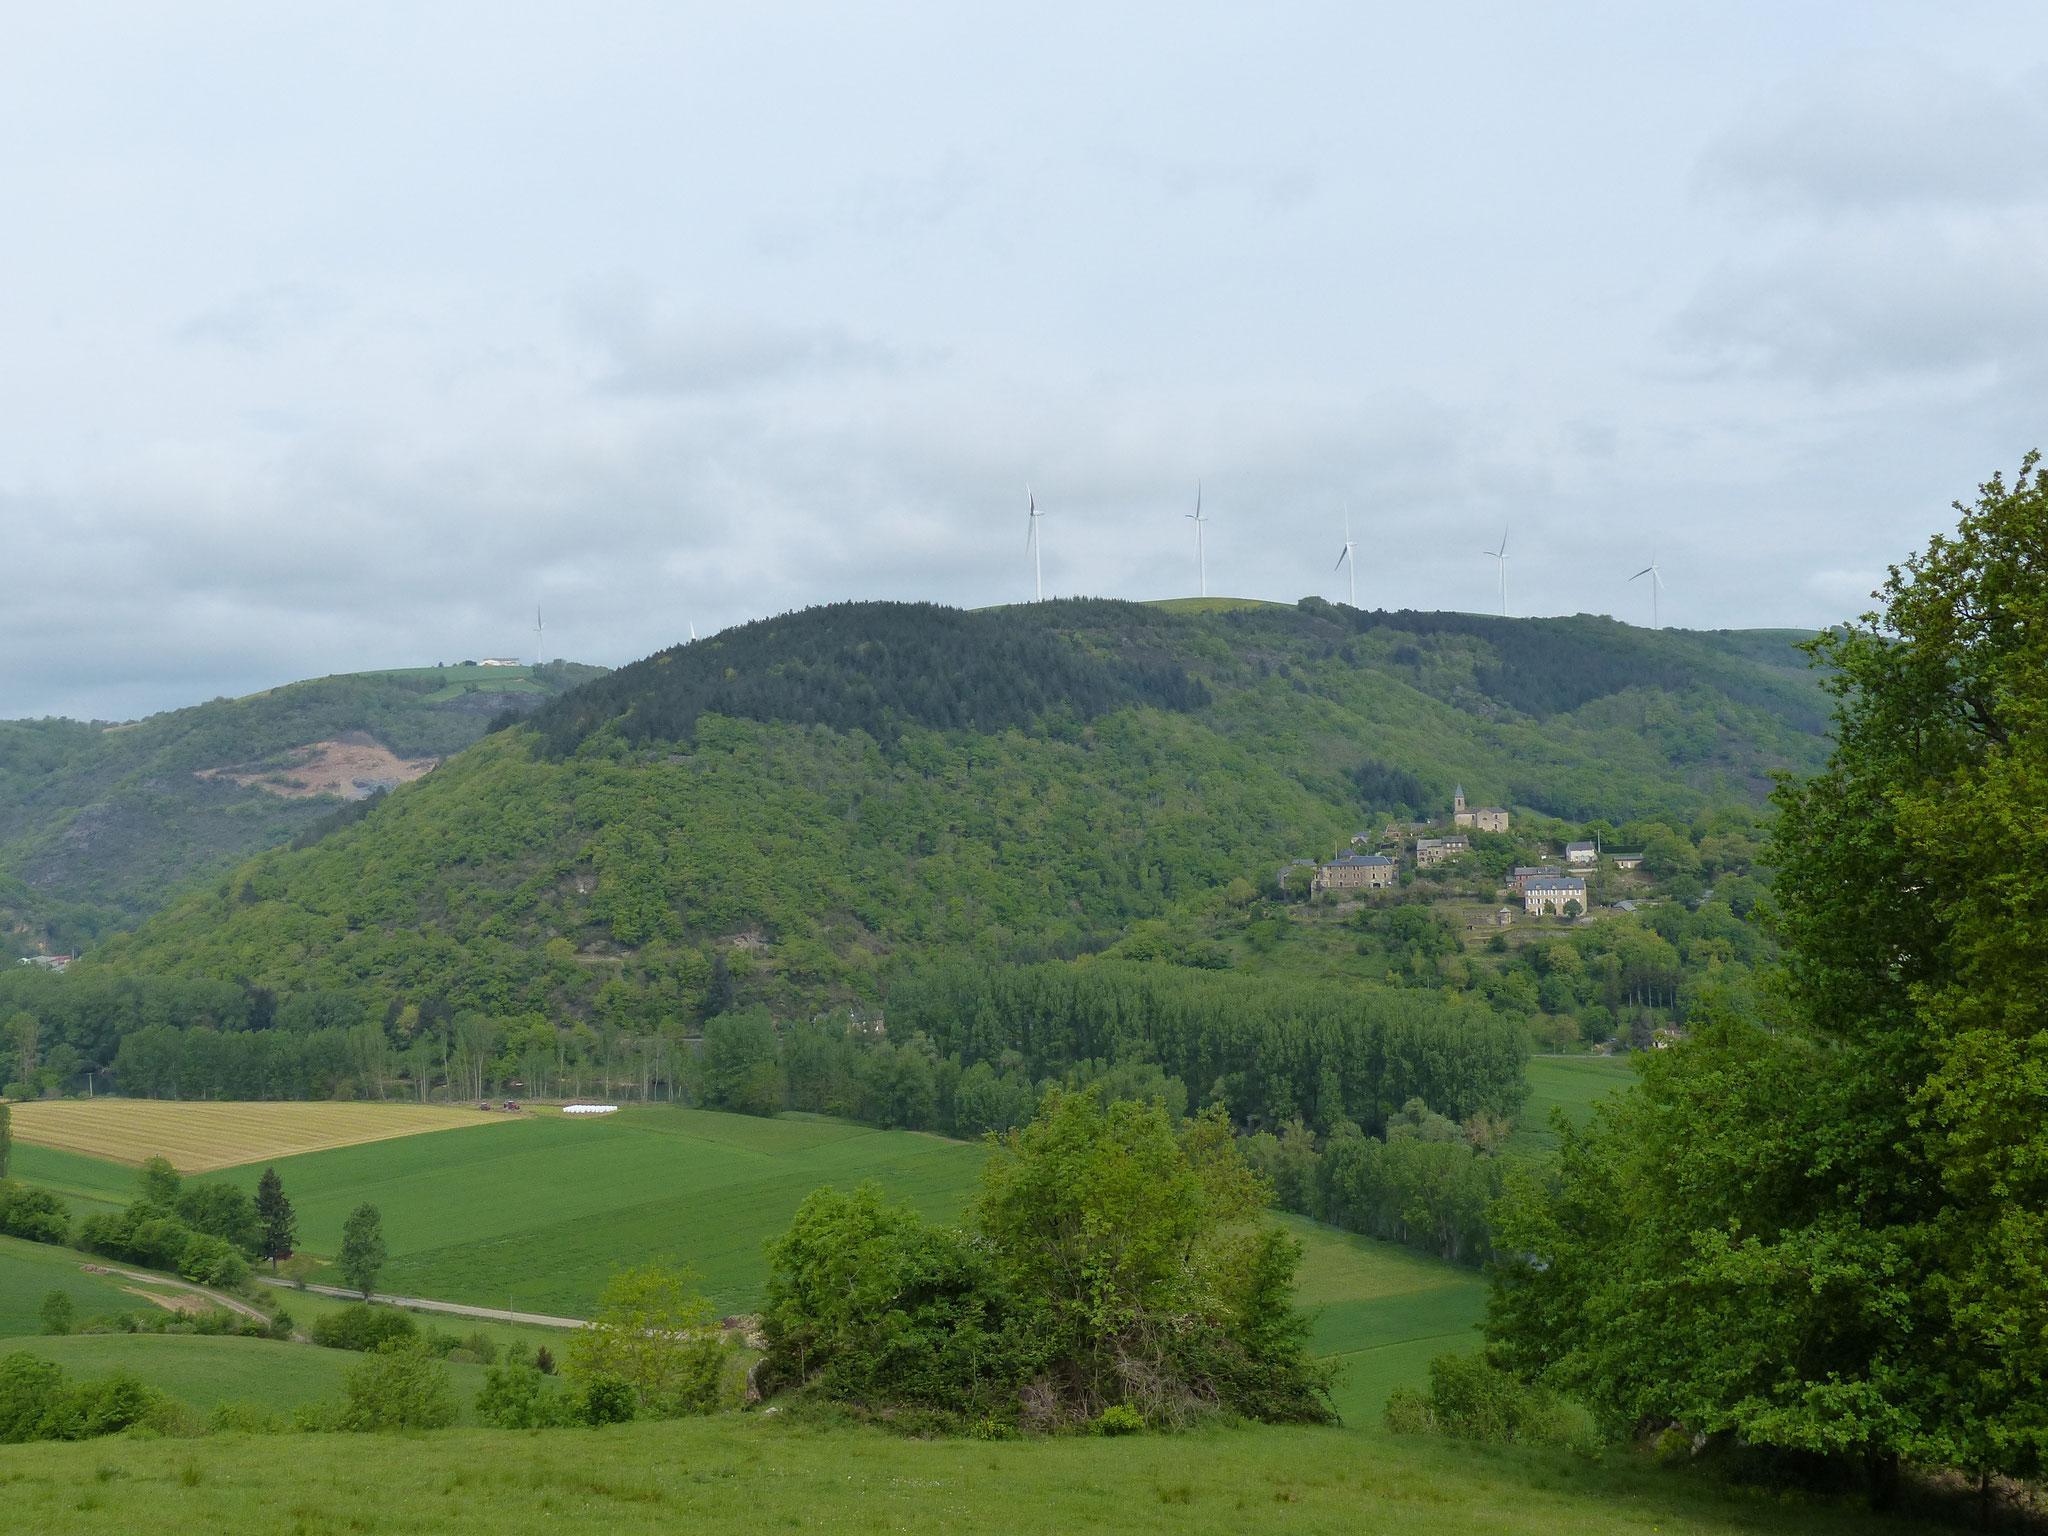 Gaycre dans la Vallée du Tarn